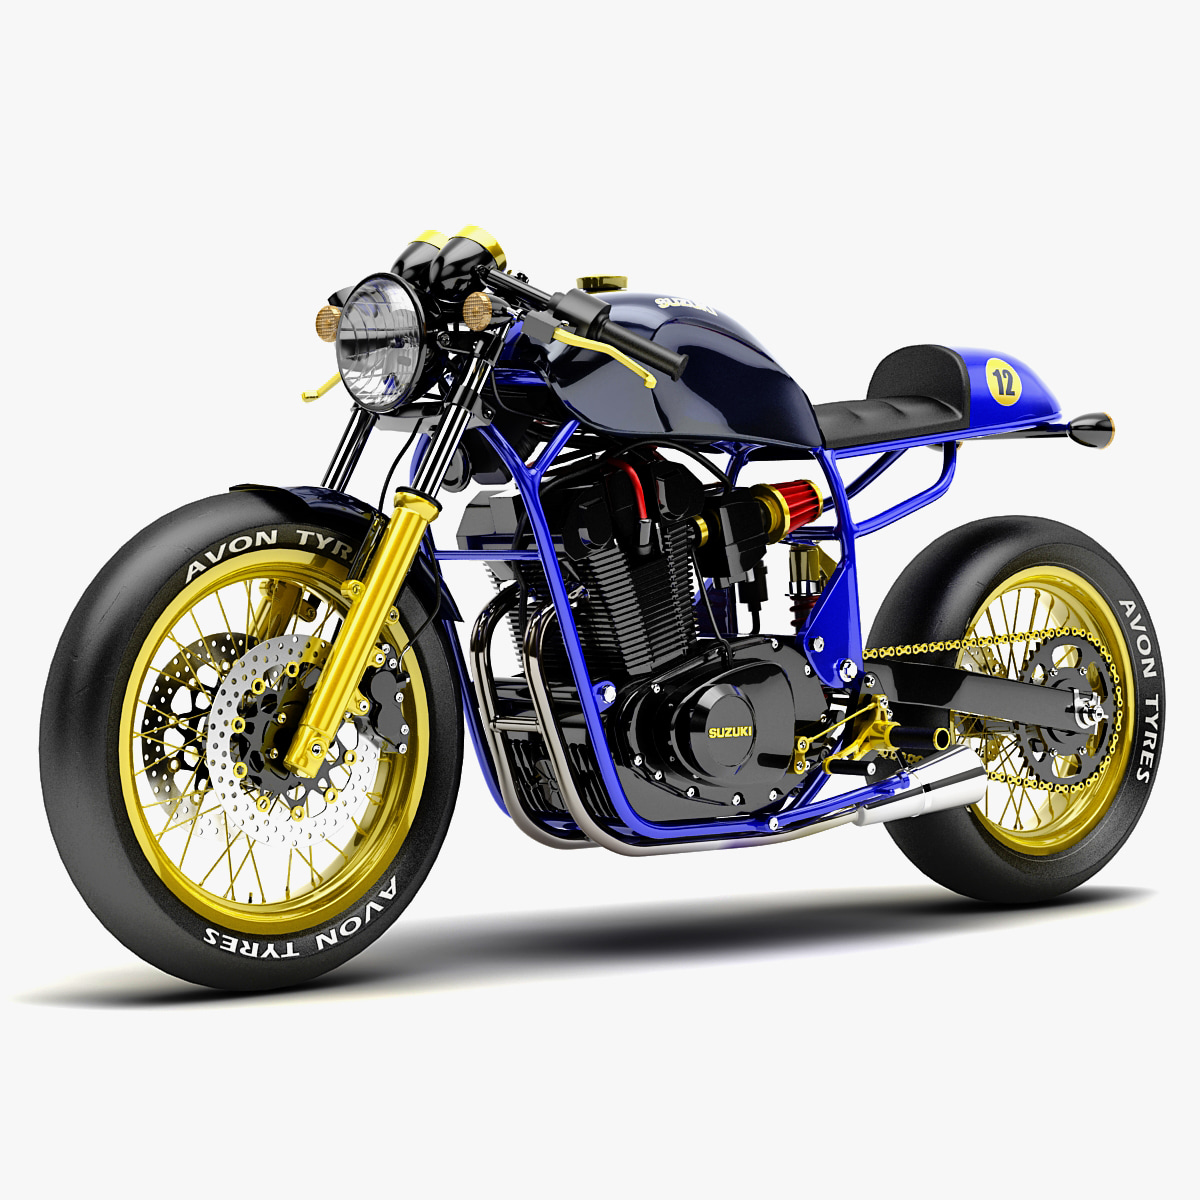 128797_Suzuki_Cafe_Racer___0001.jpg